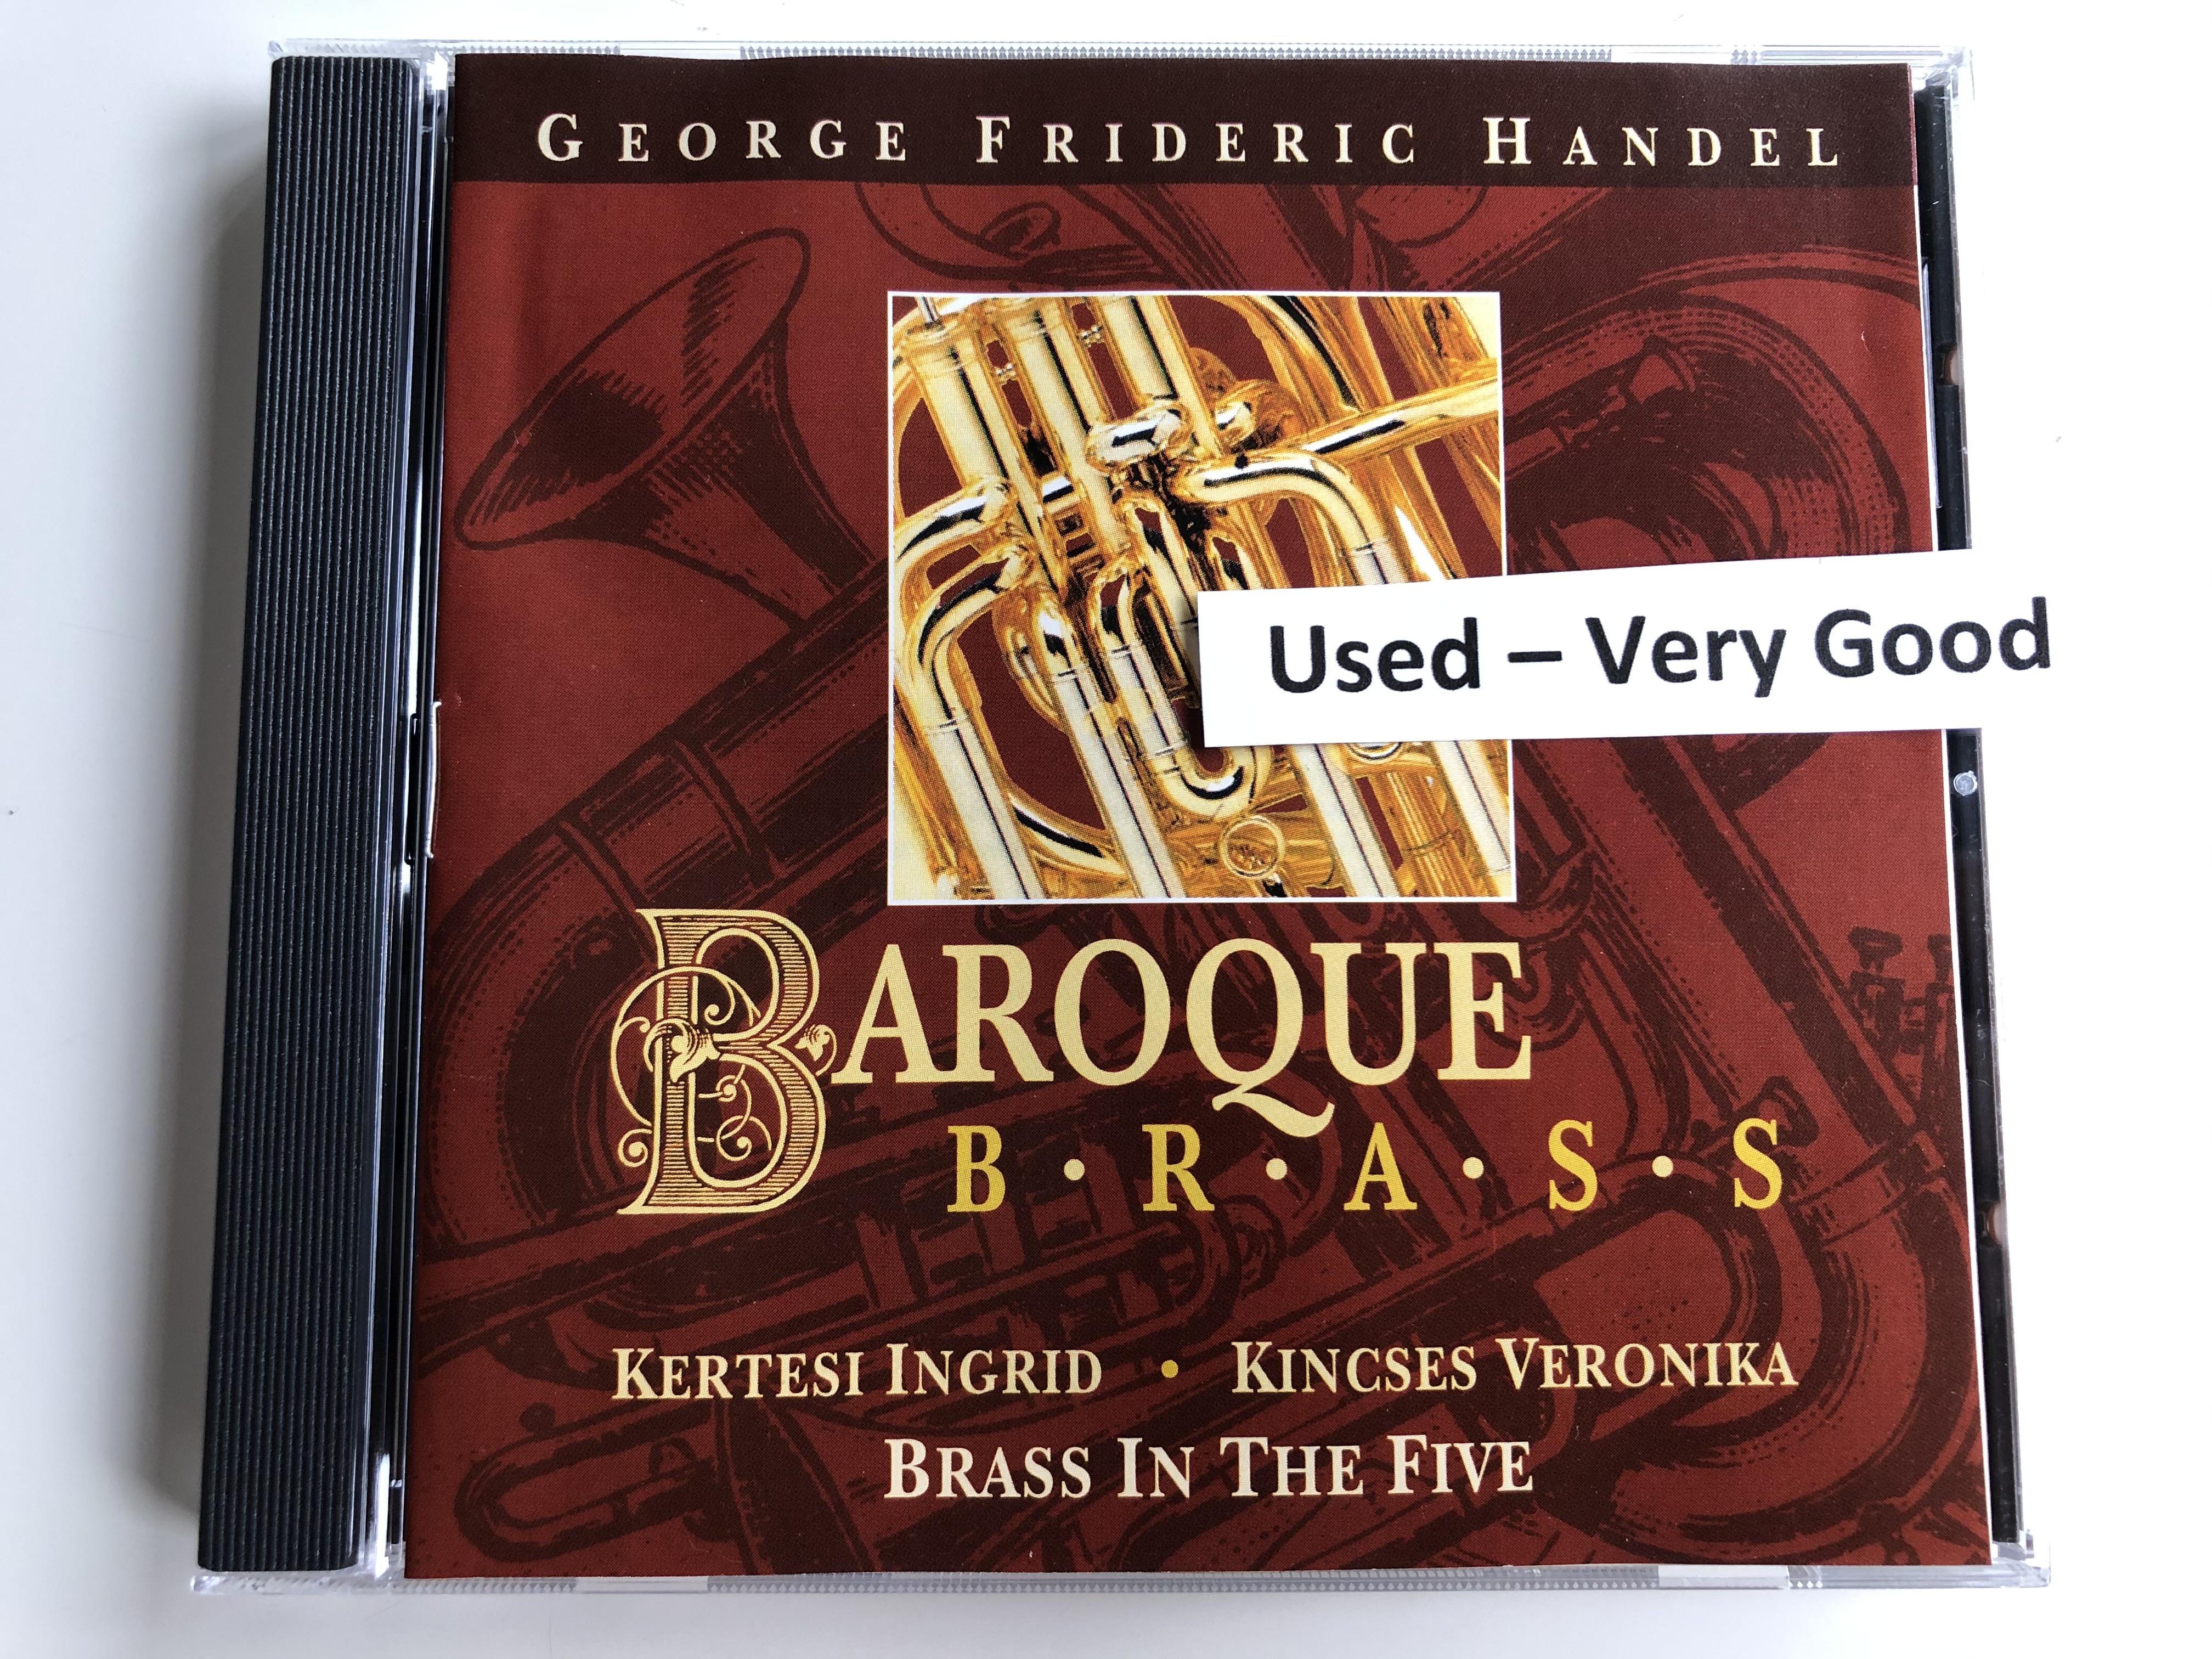 george-frideric-handel-baroque-brass-kertesi-ingrid-kincses-veronika-brass-in-the-five-brass-audio-cd-brass-008-1-.jpg